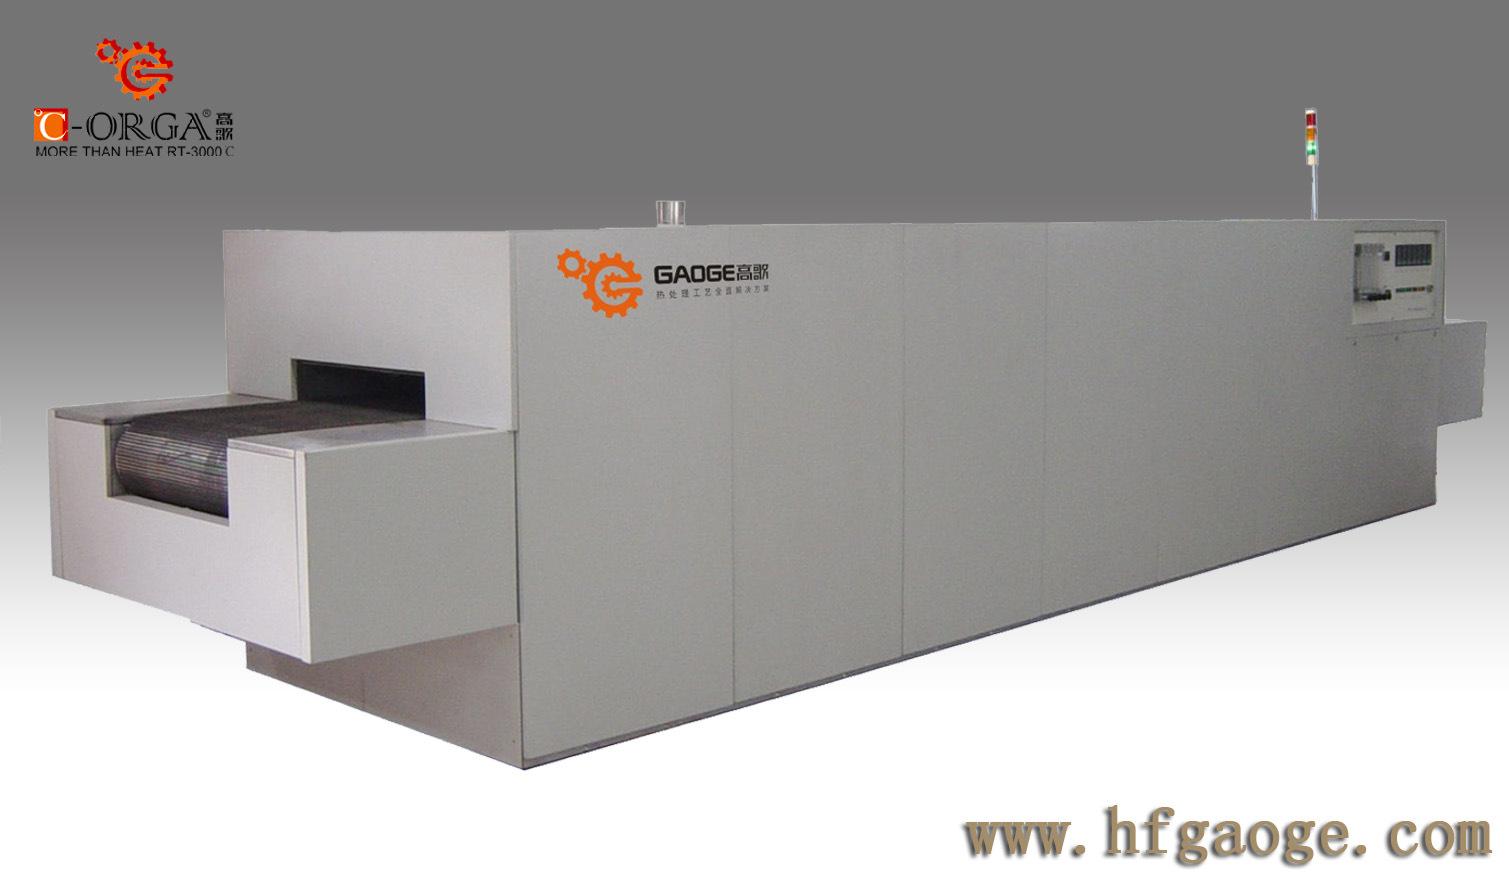 Roller Furnace for Large-Scale Production Enterprises